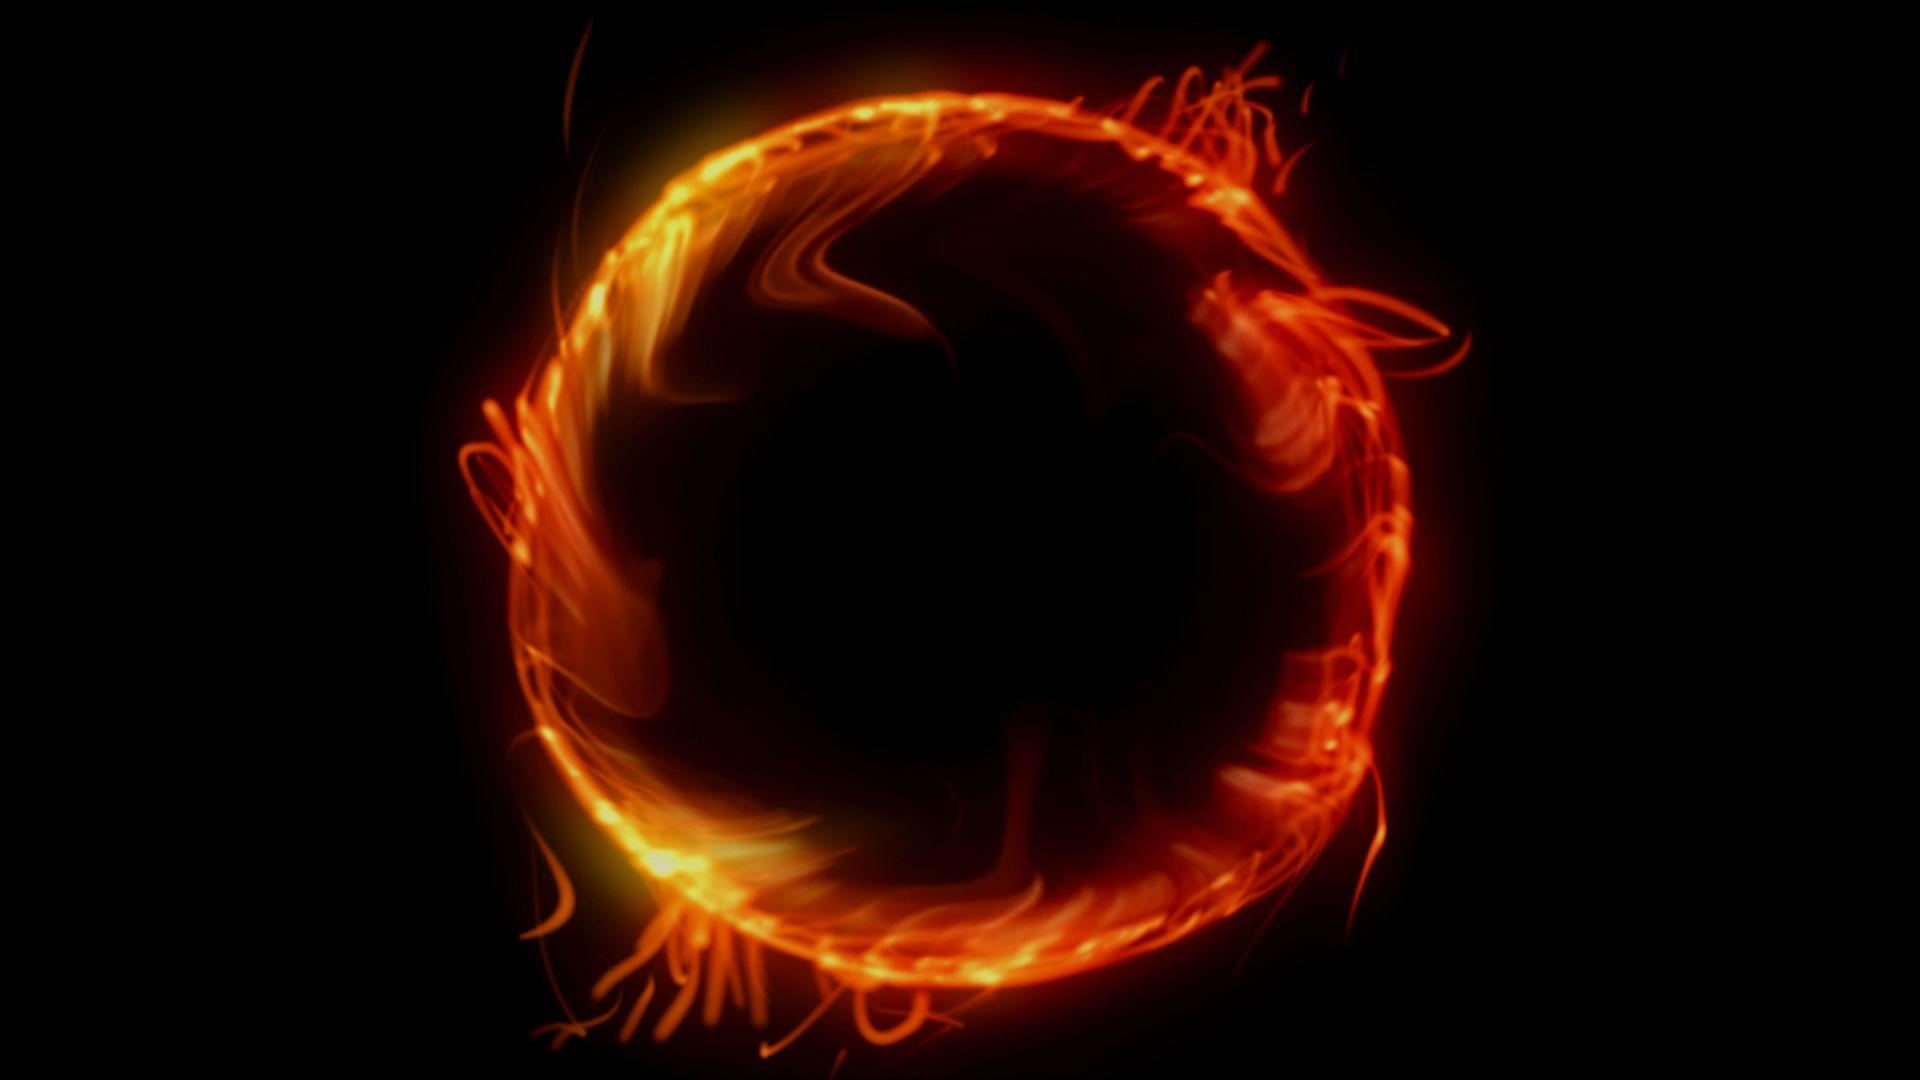 Darkside - Full Circle (Limited Editon)